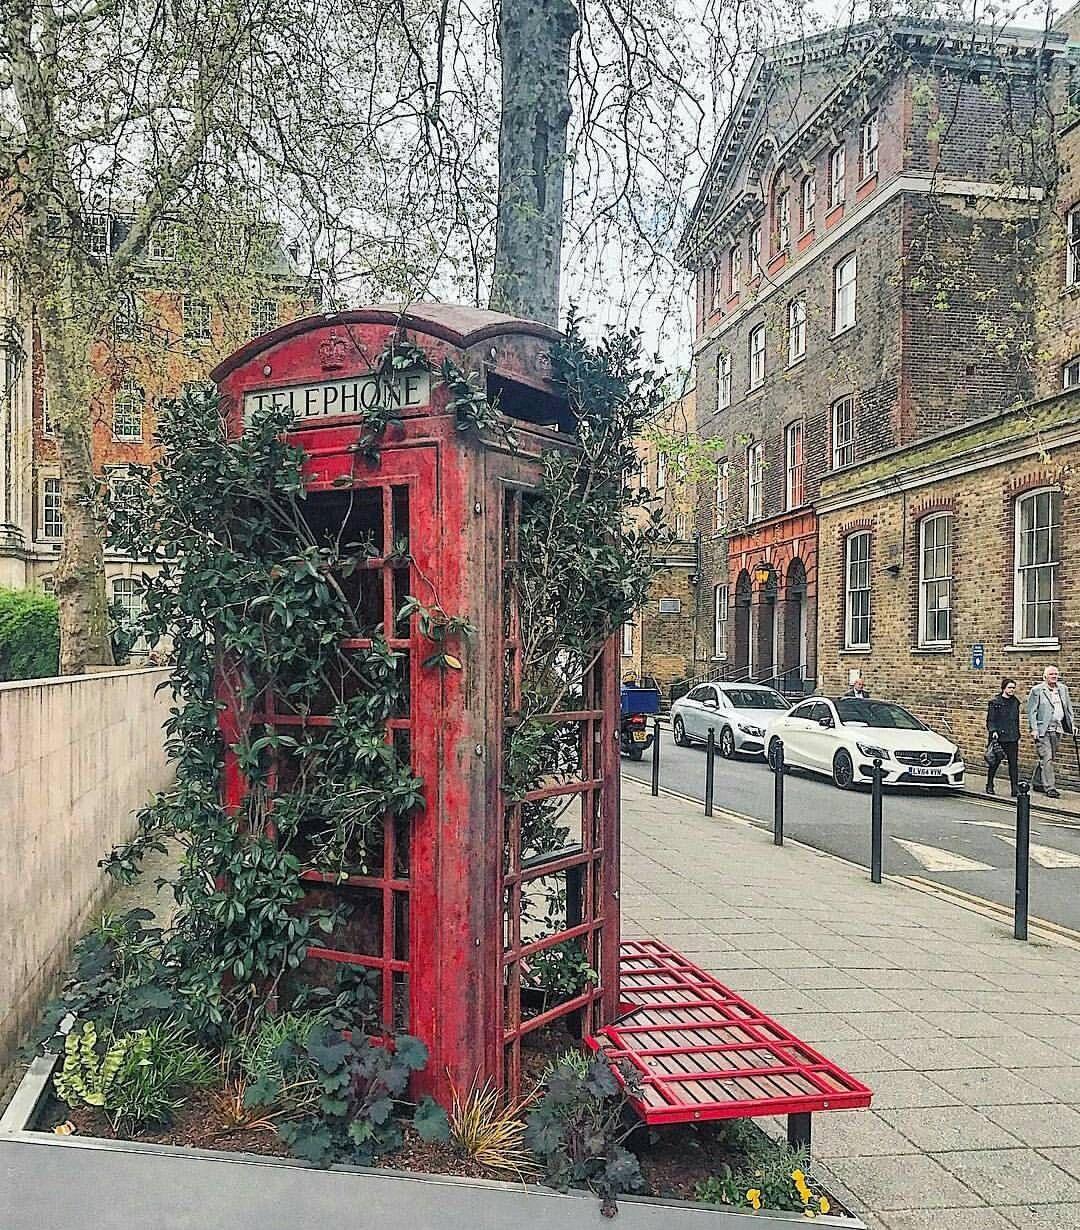 London Phone Box Now A Planter